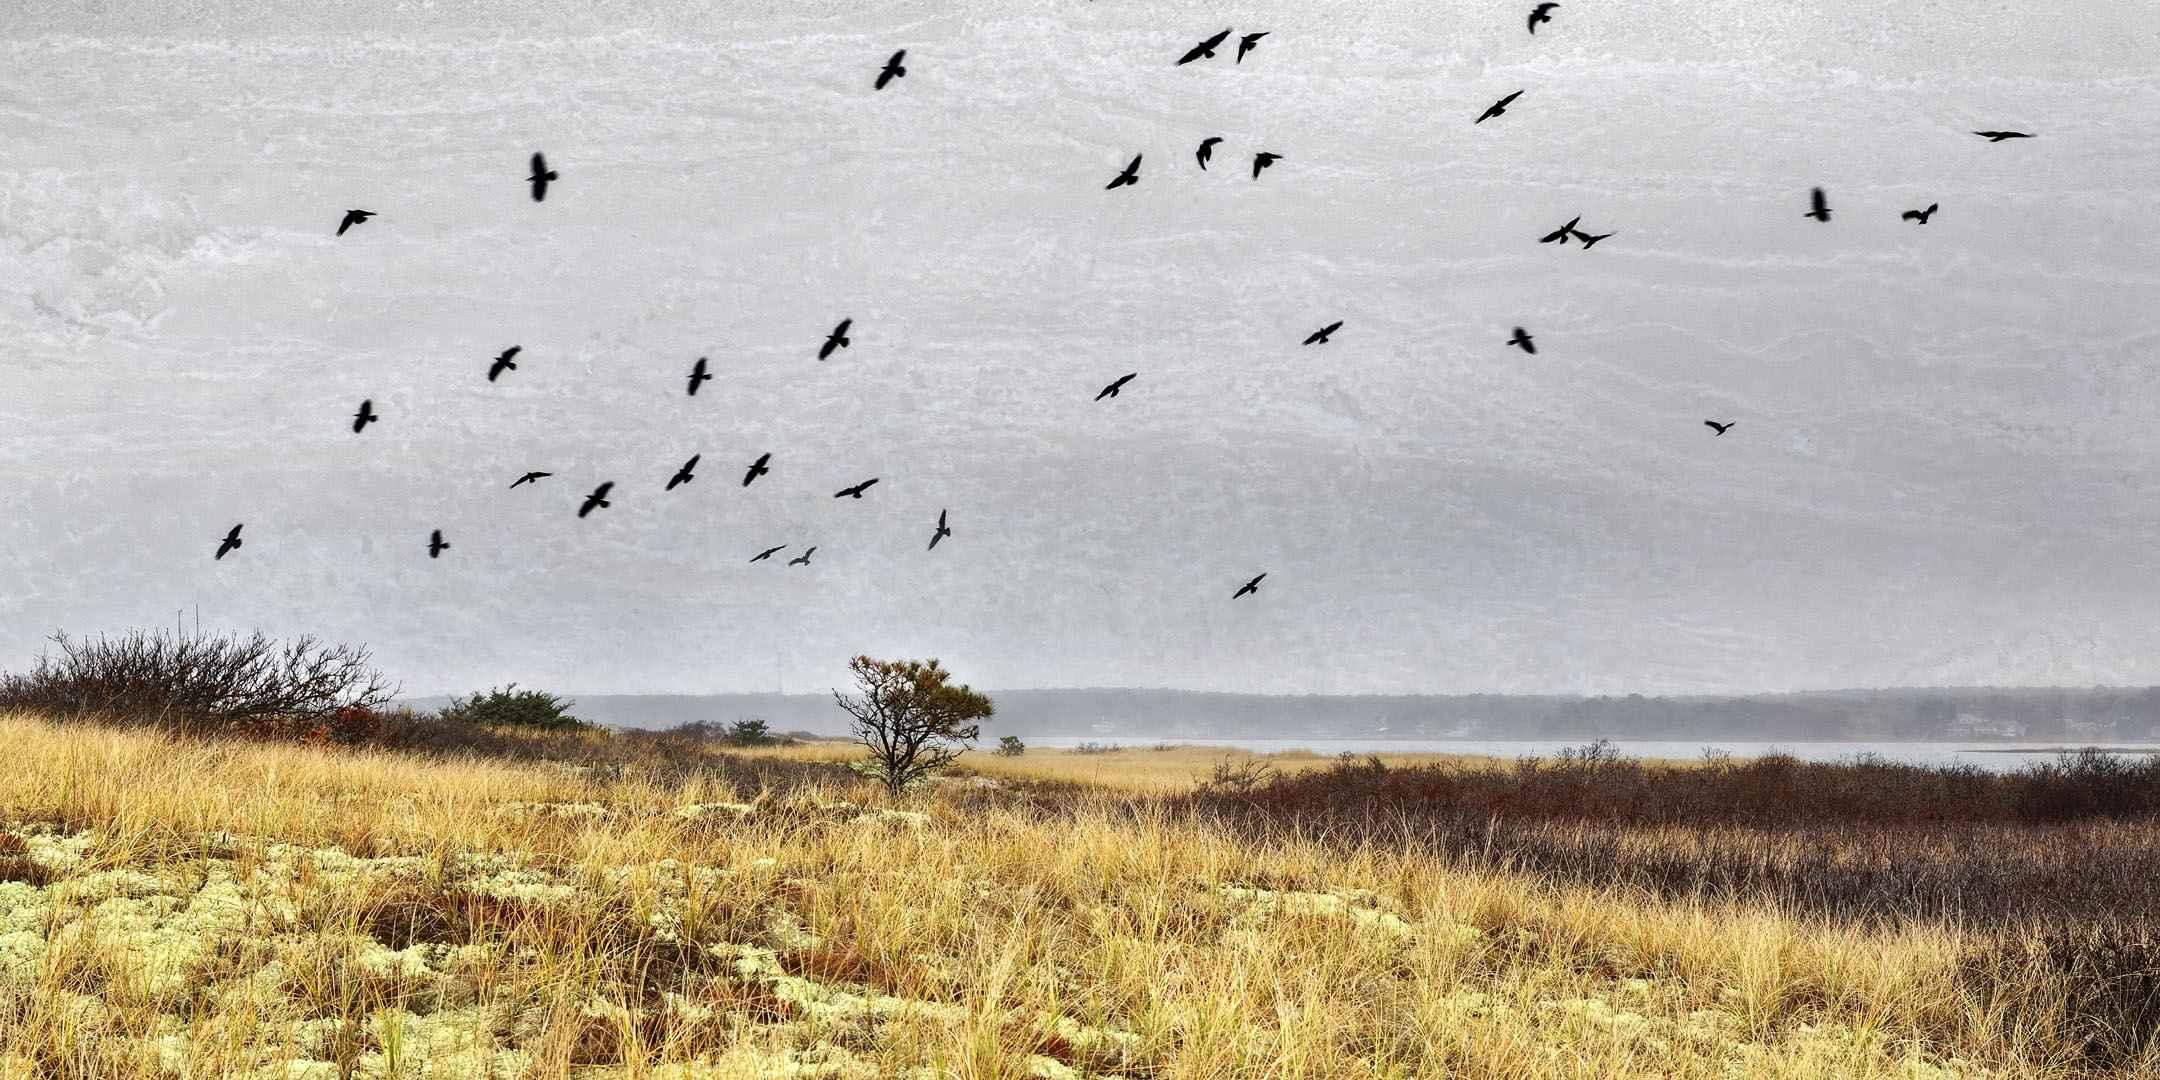 Winter Crows by  Michael Stimola - Masterpiece Online